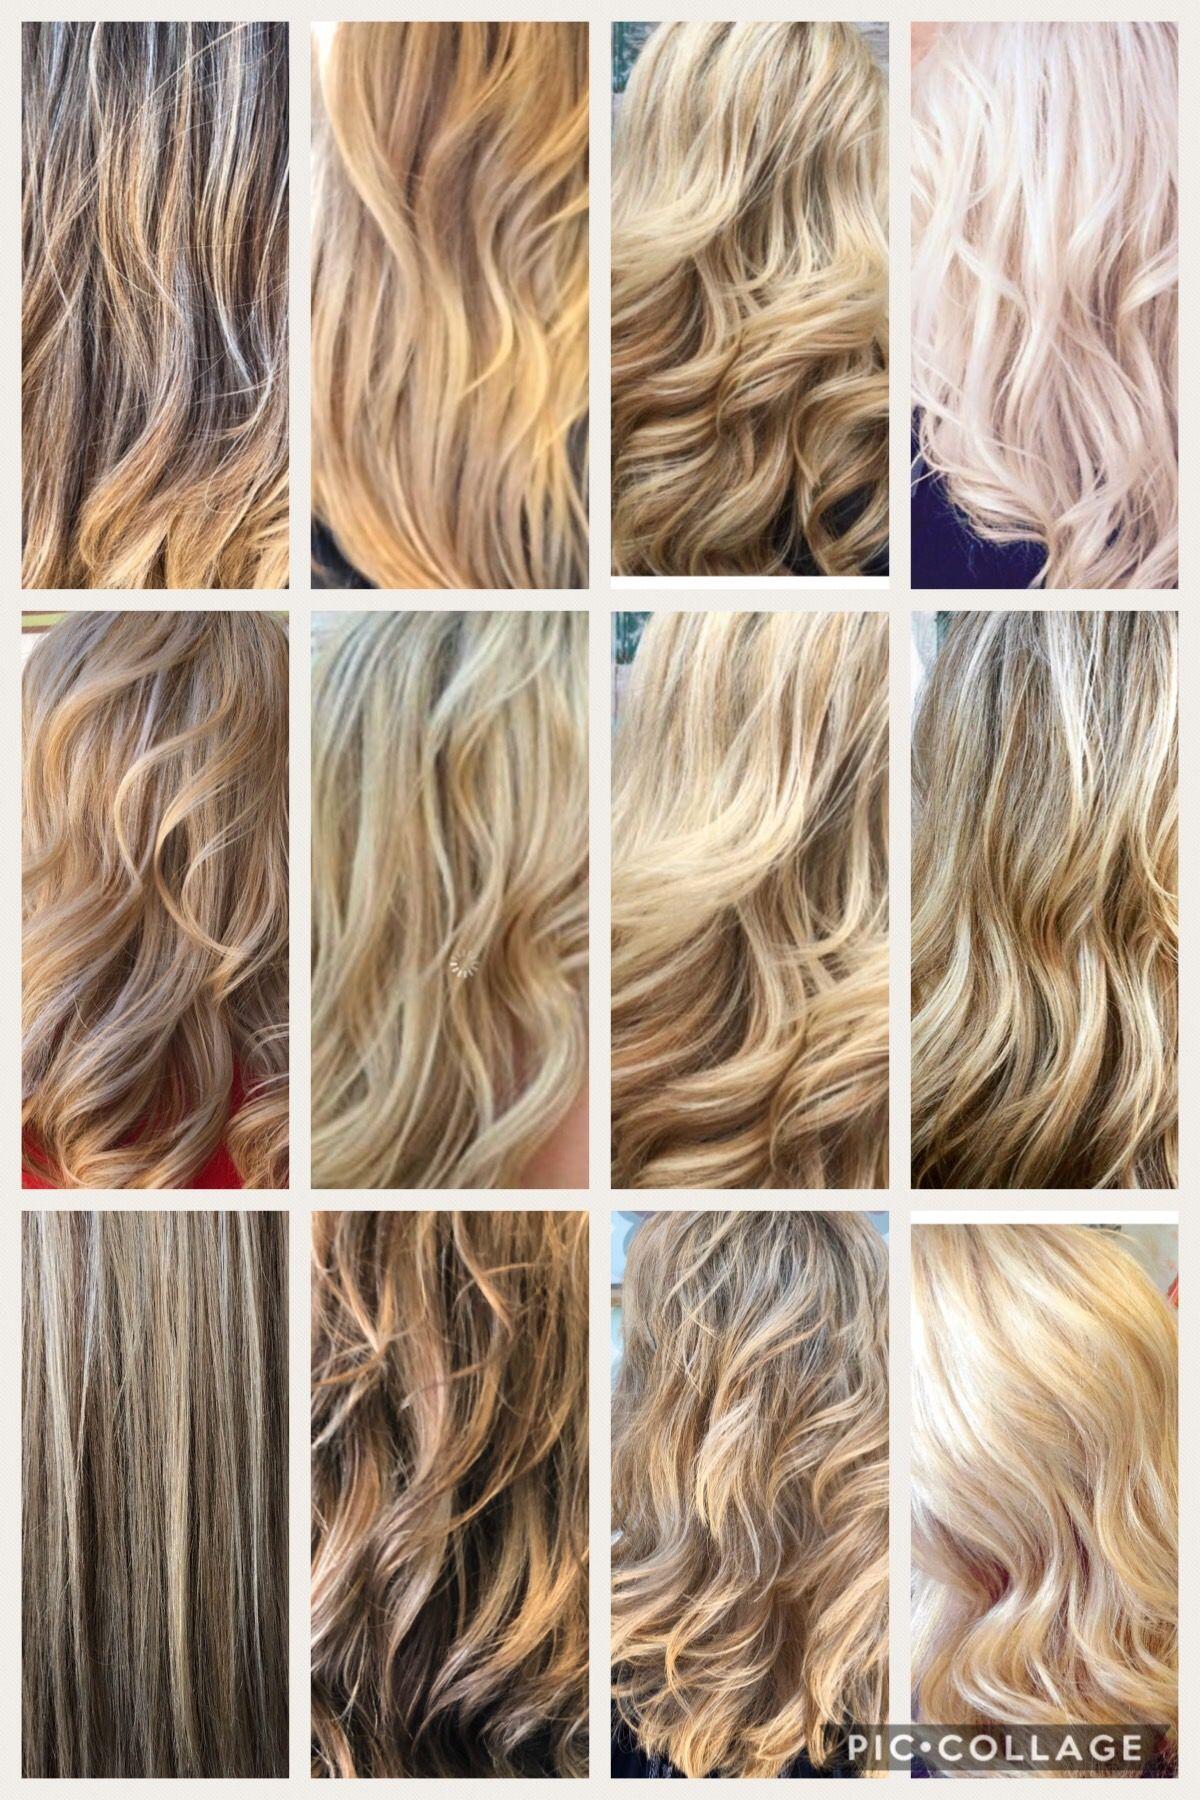 Choose Your Color Blondes Chey Le Do Blonde Color Different